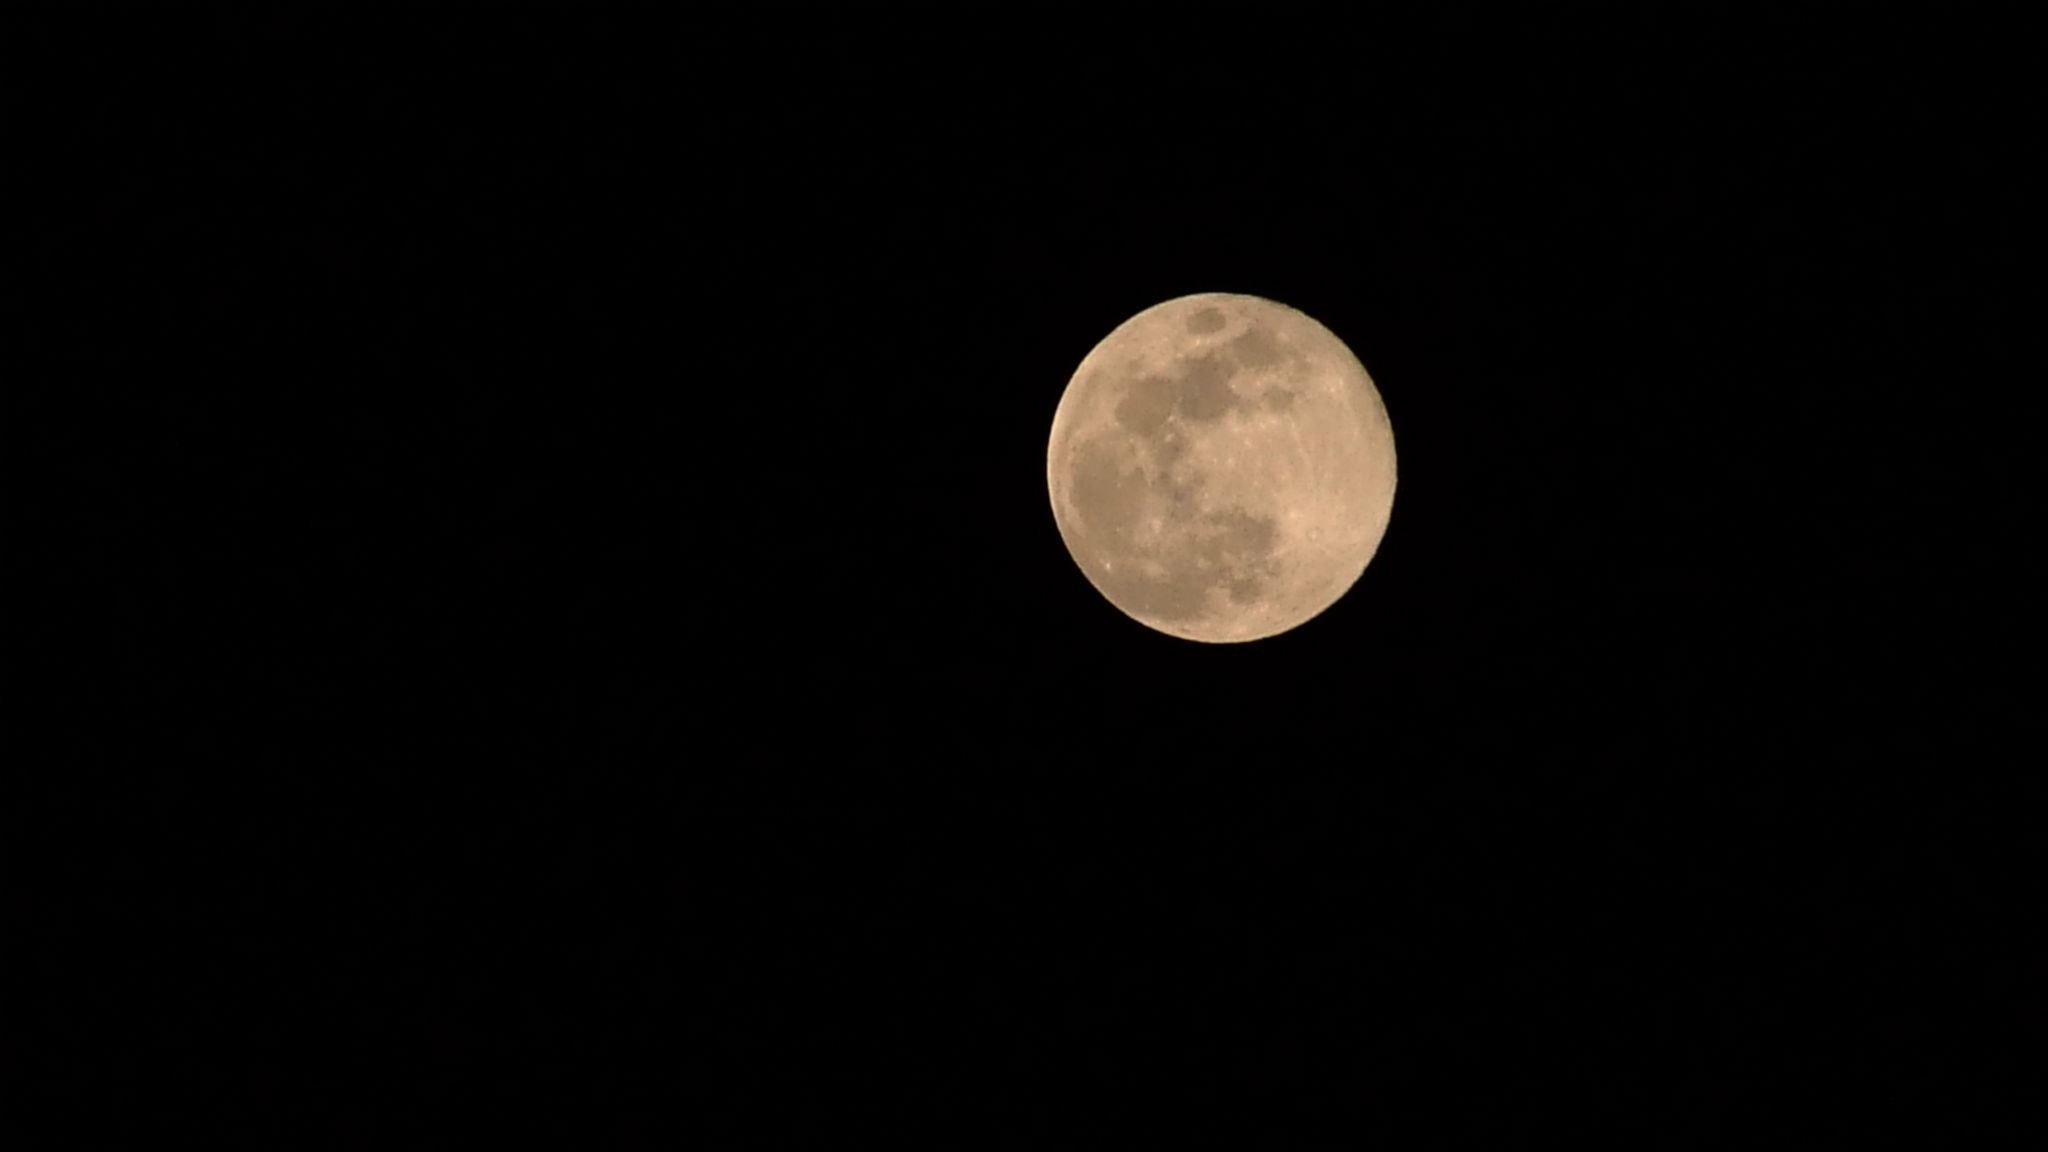 En lugn måne